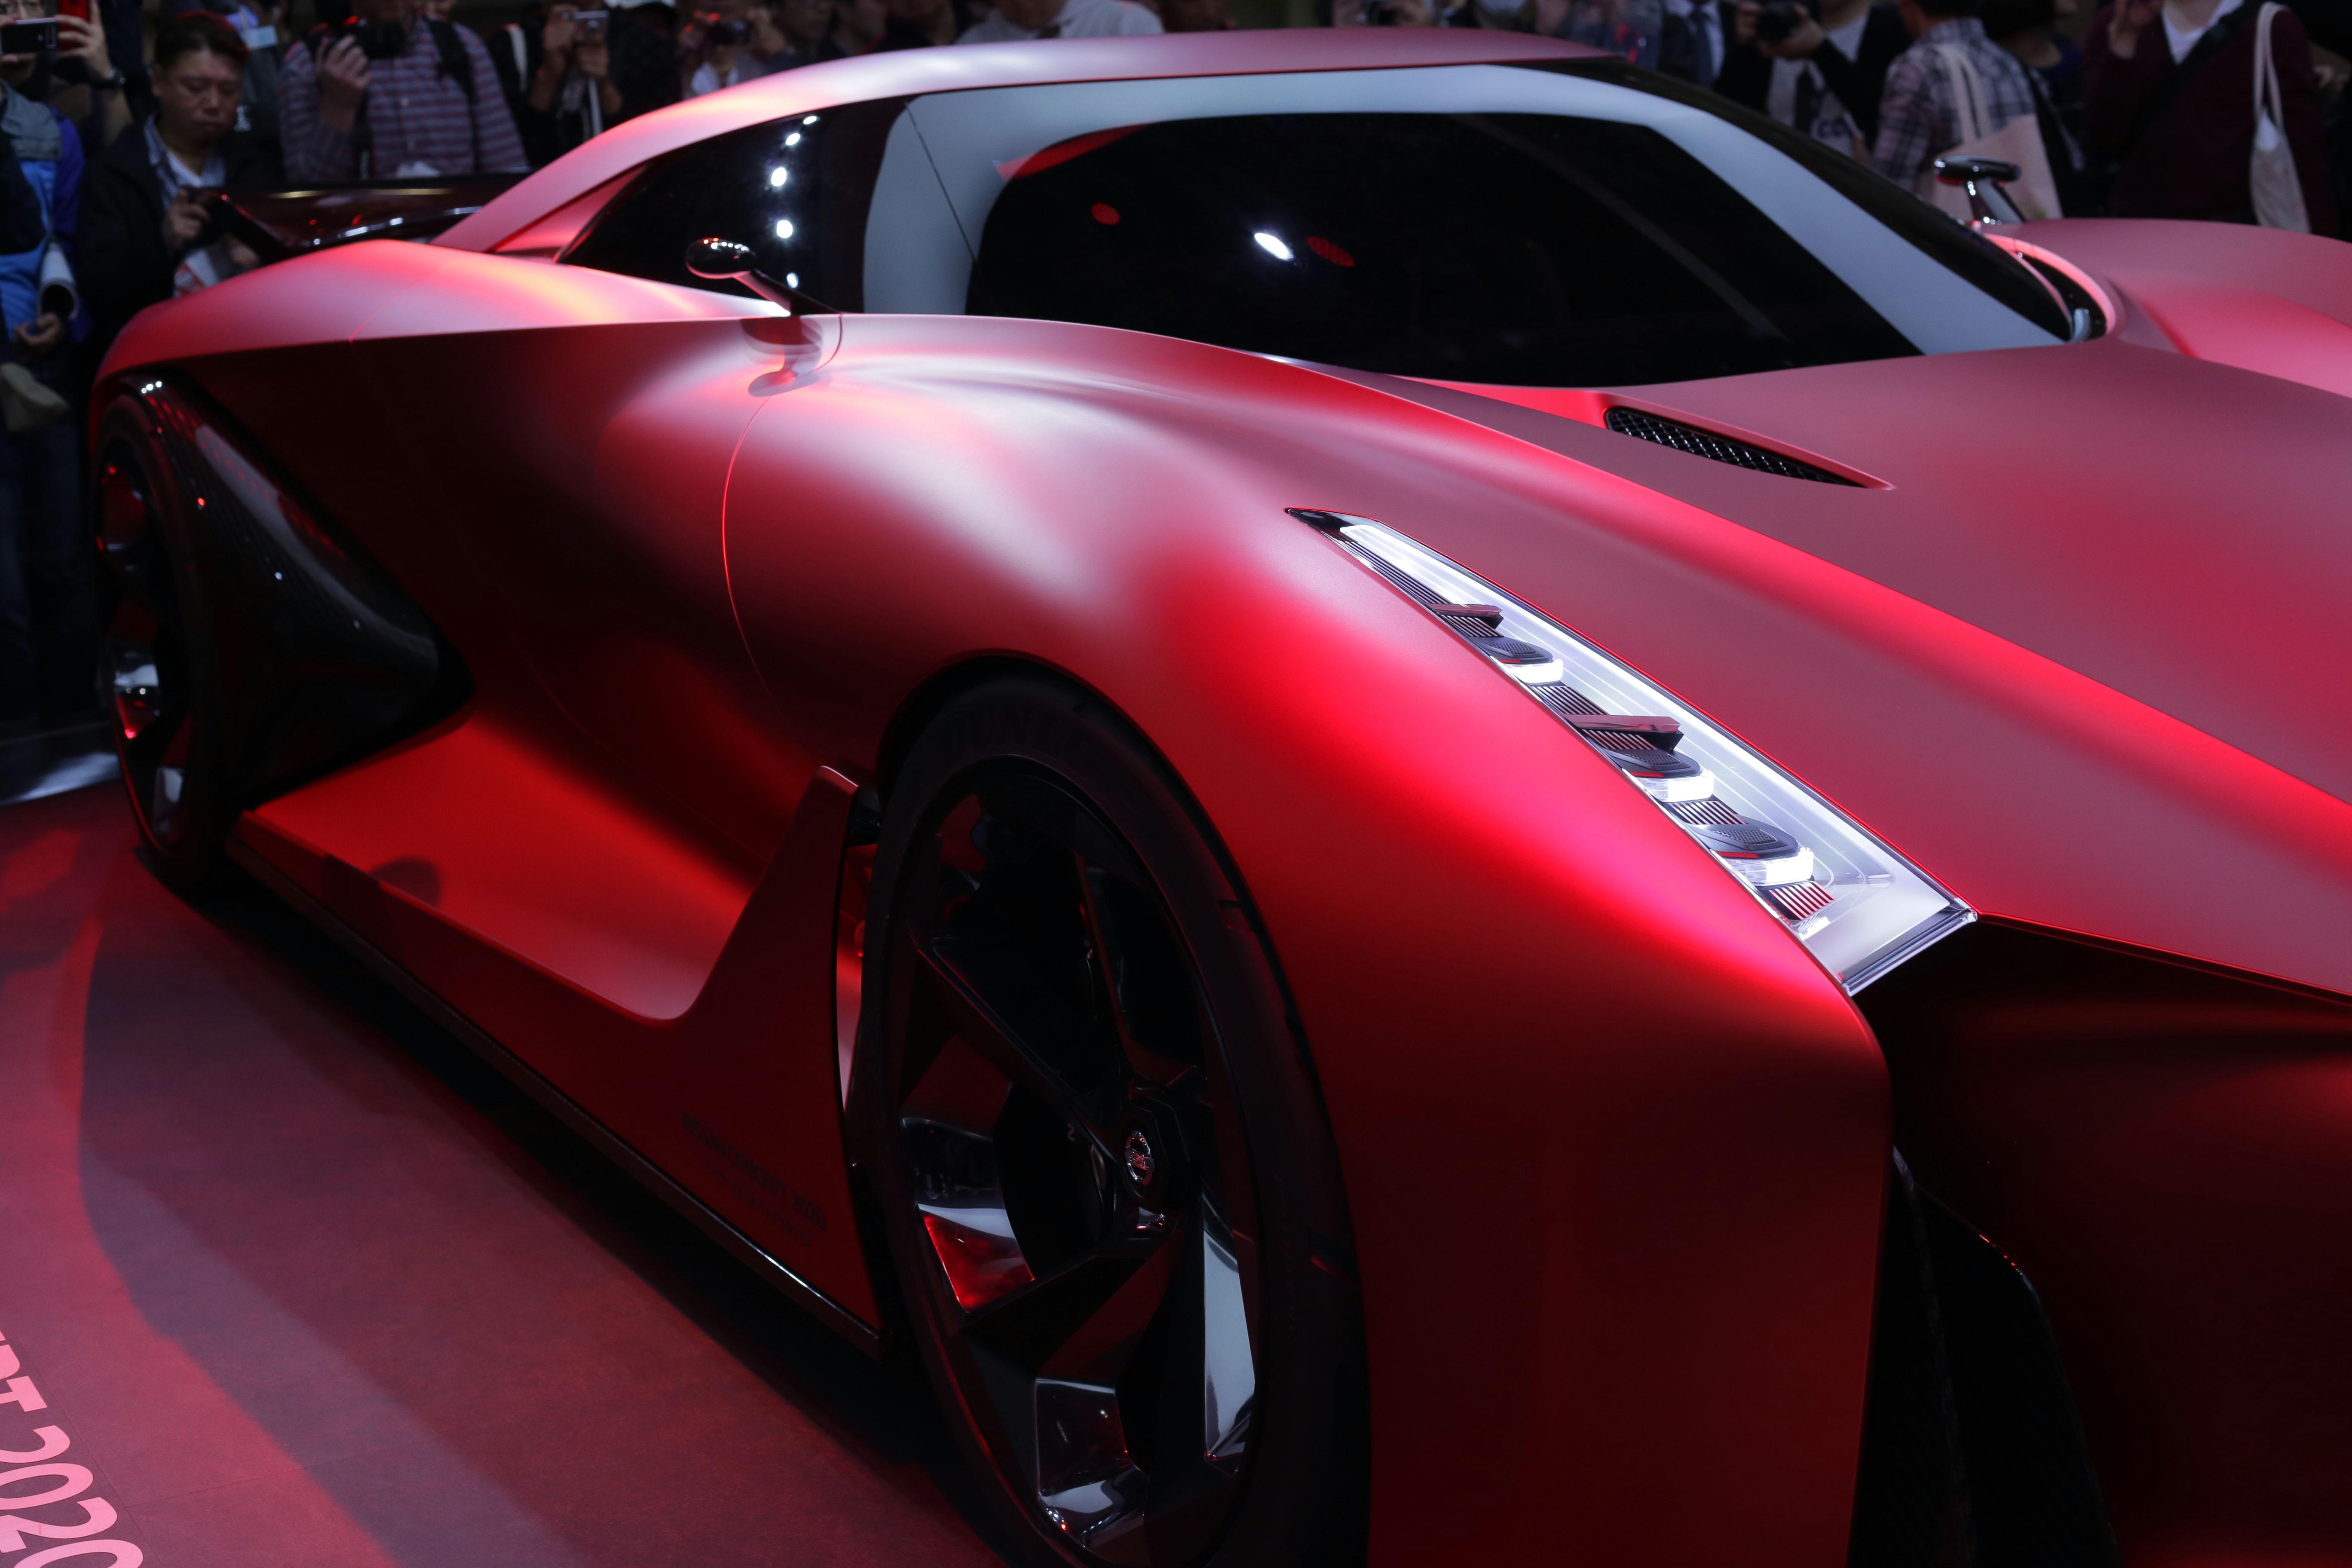 Grand Turismo Nissan GTR